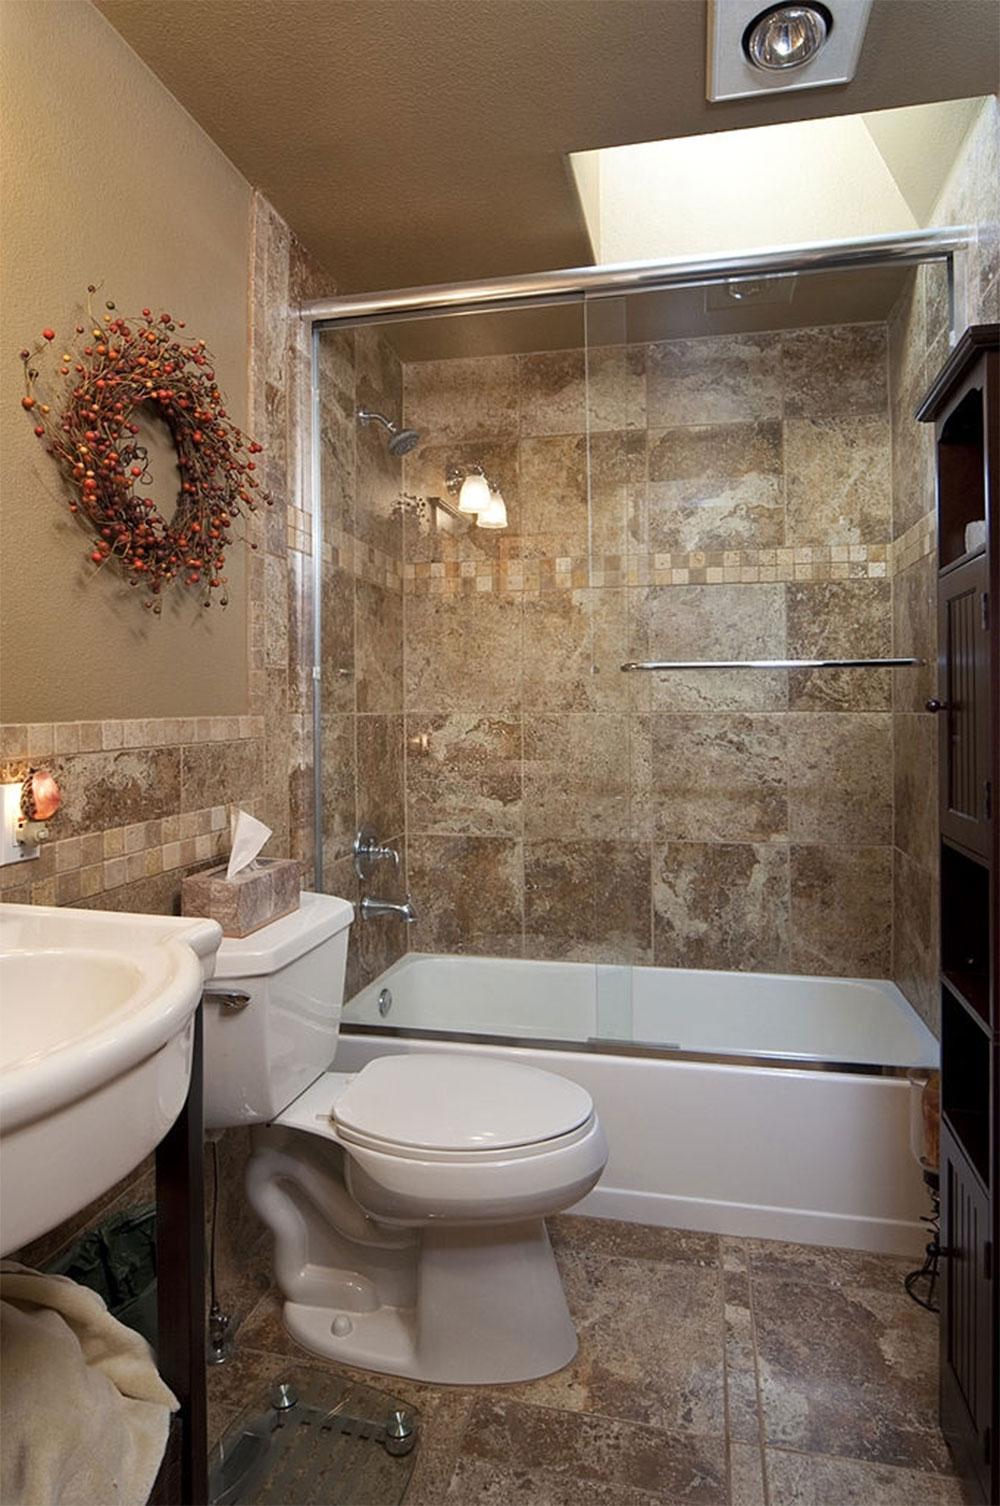 image015-1 How to measure shower doors